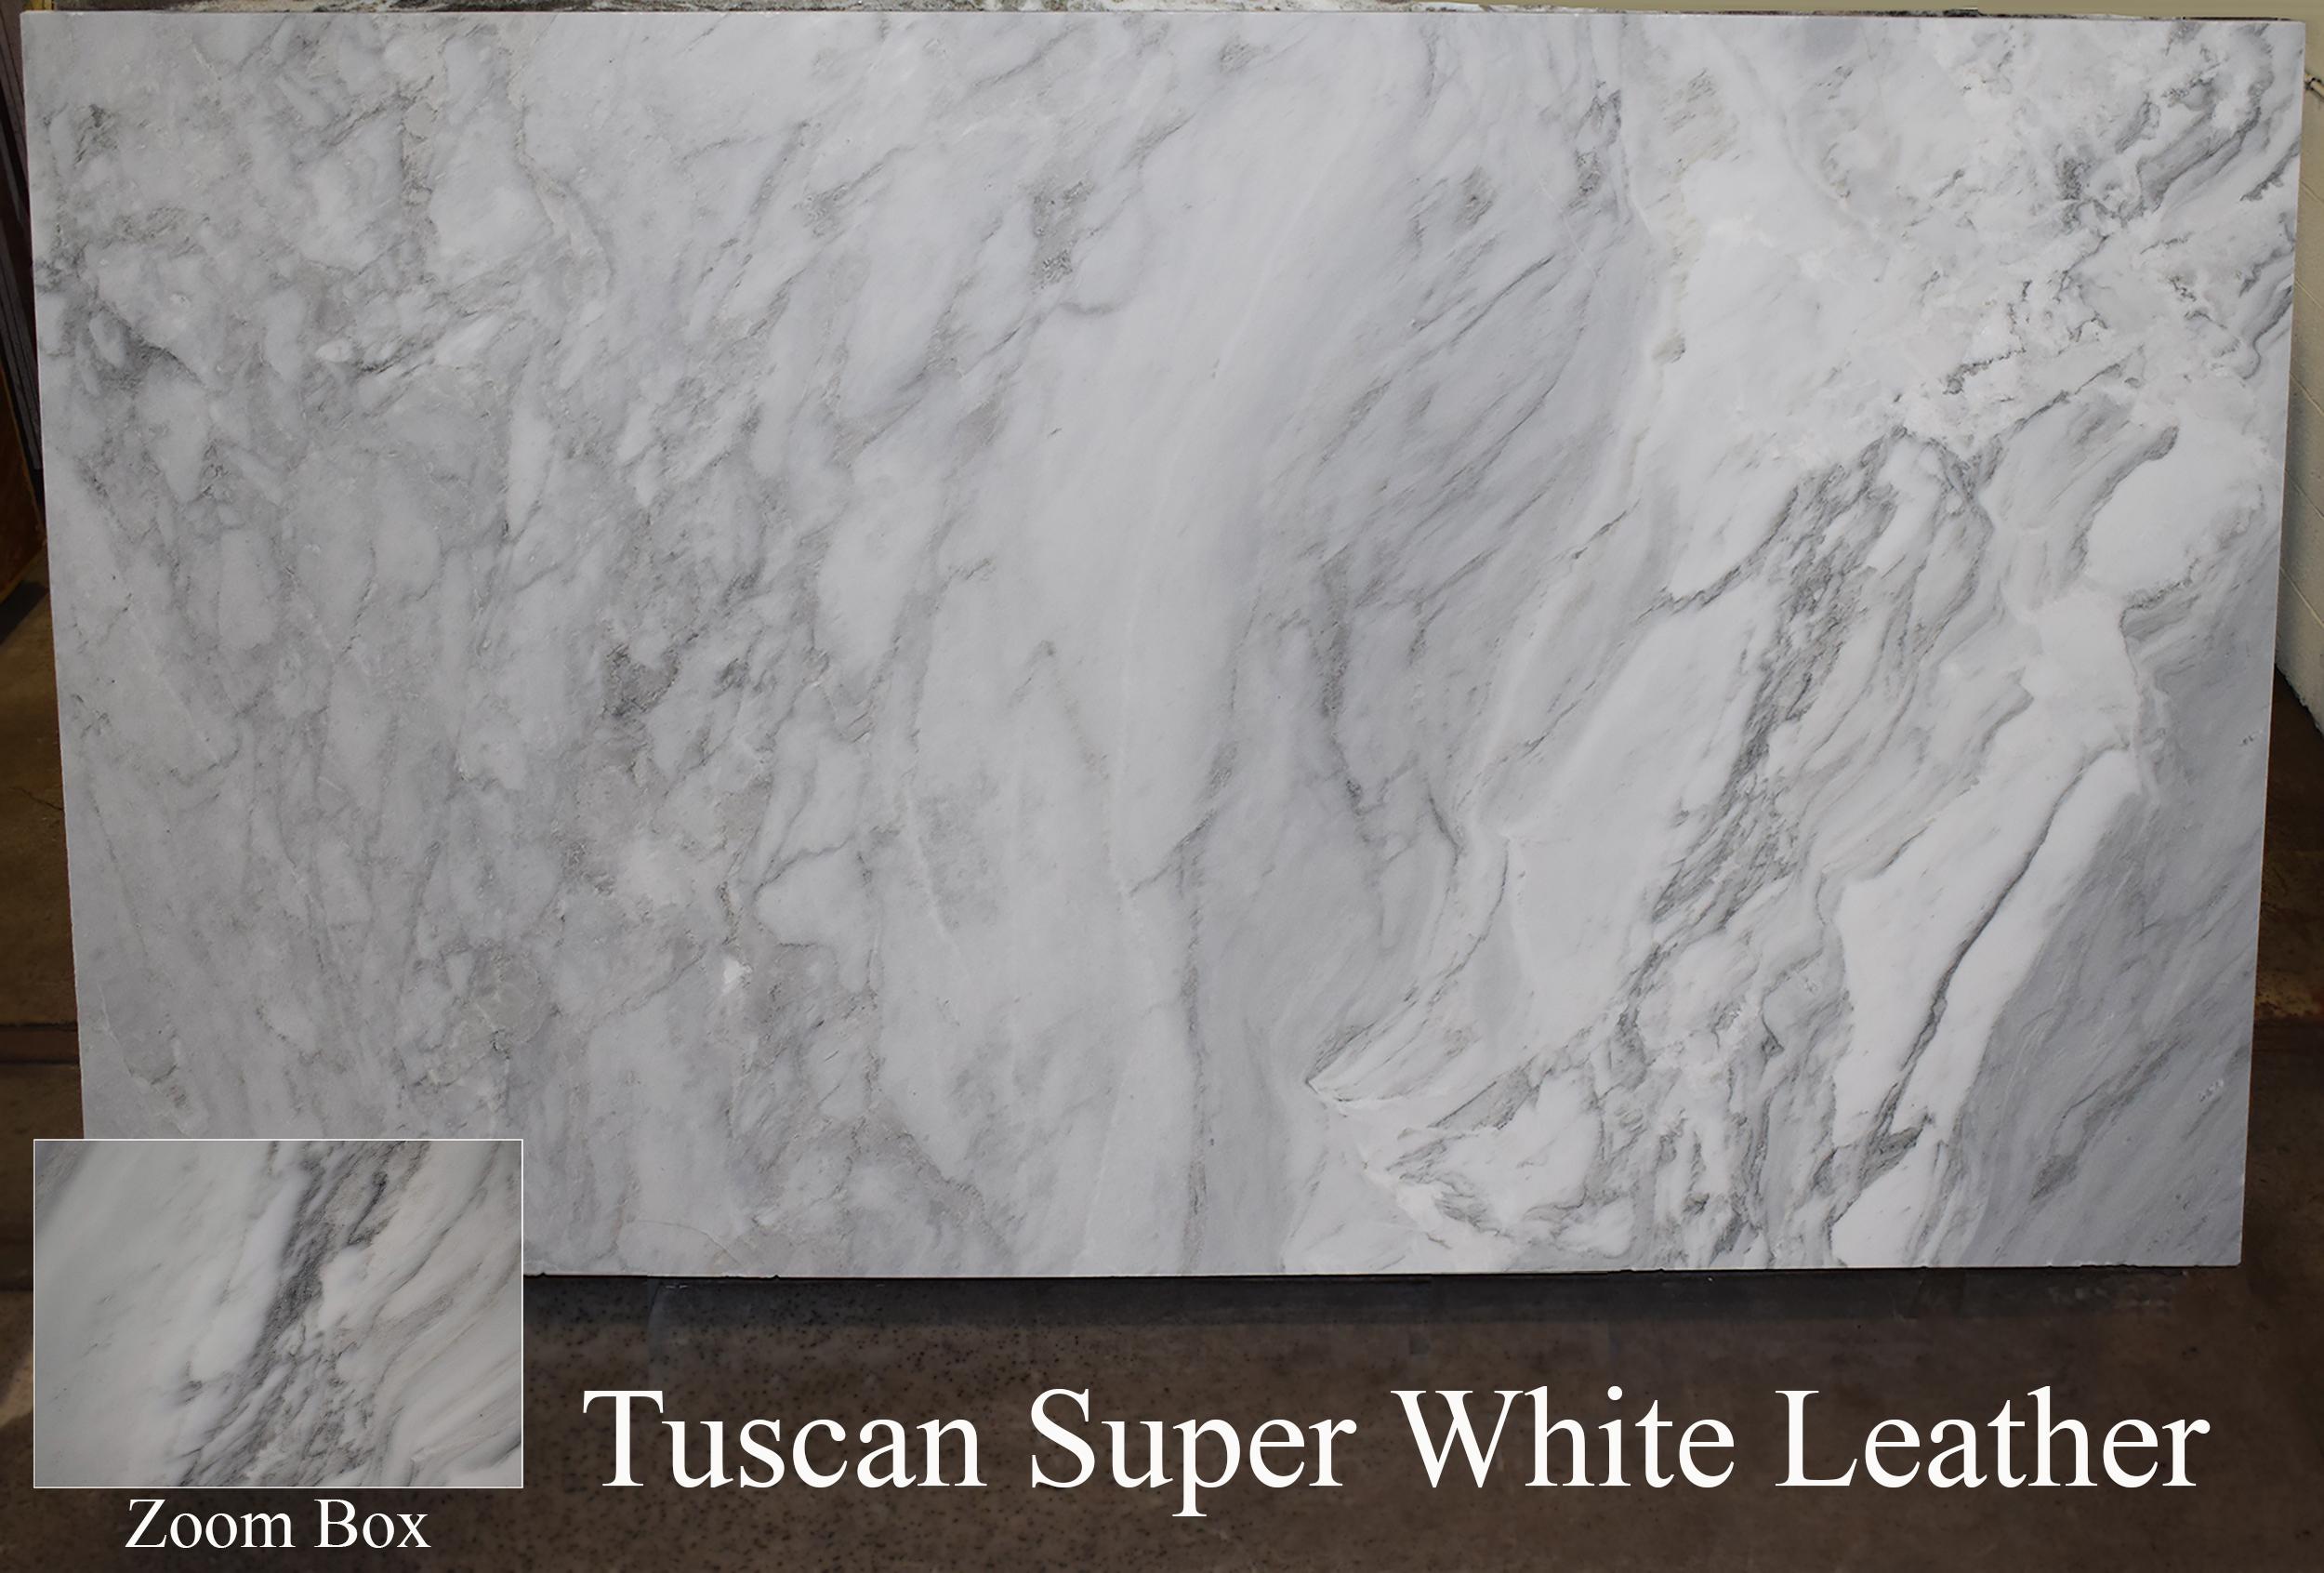 TUSCAN SUPER WHITE LEATHER